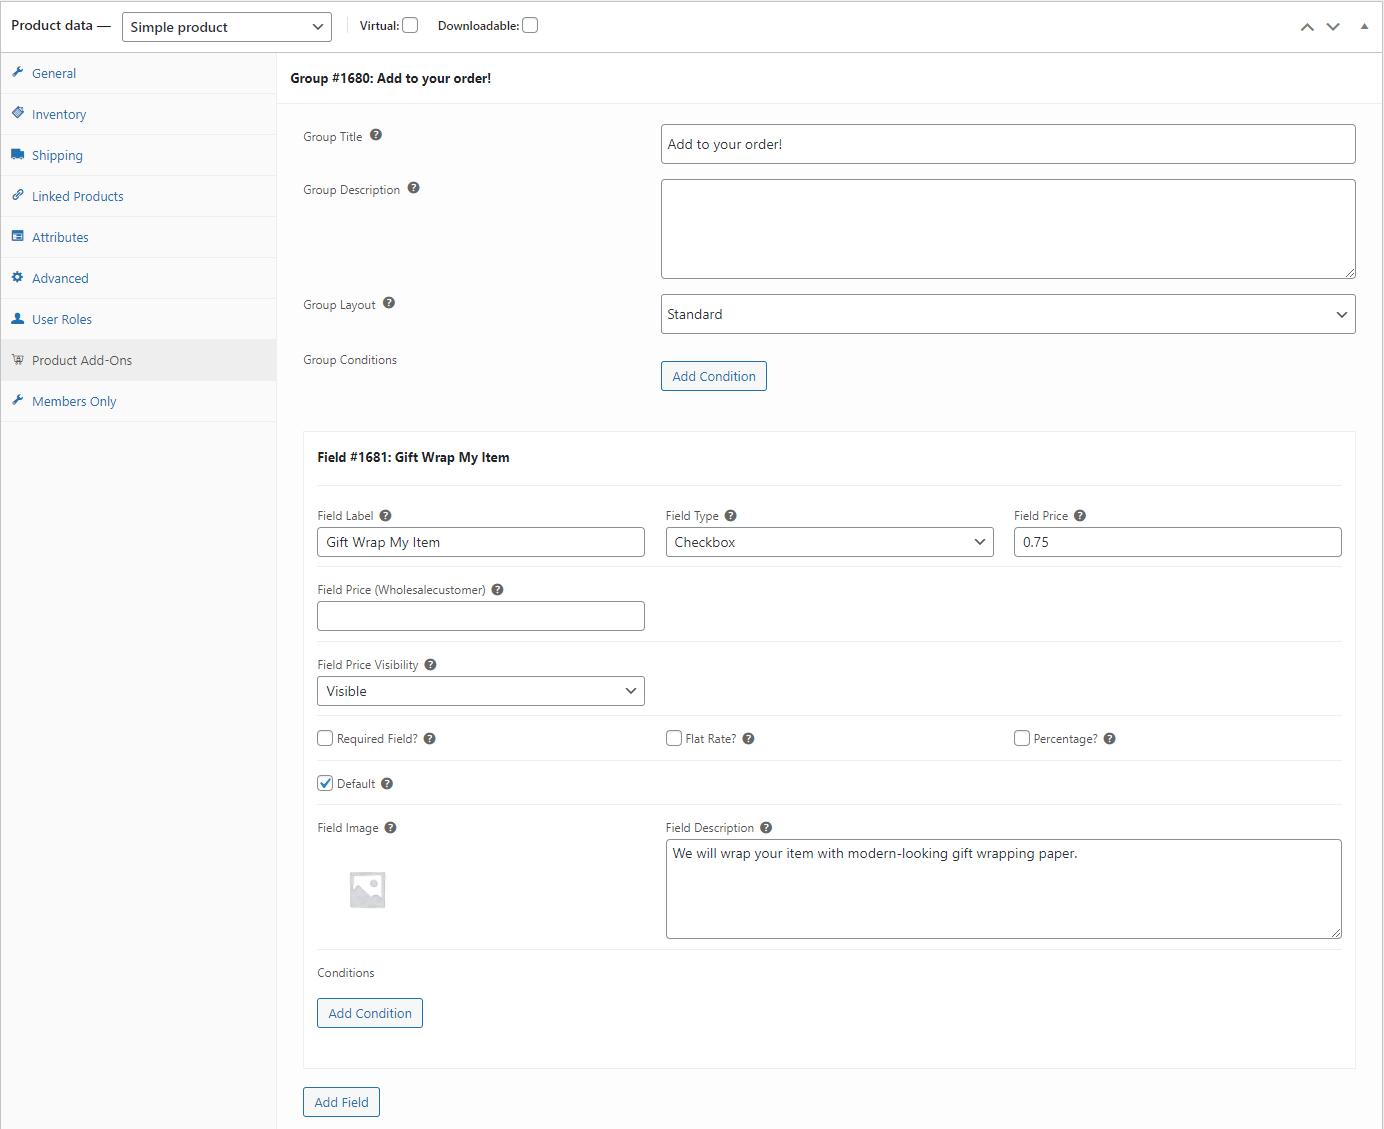 Parameters settings